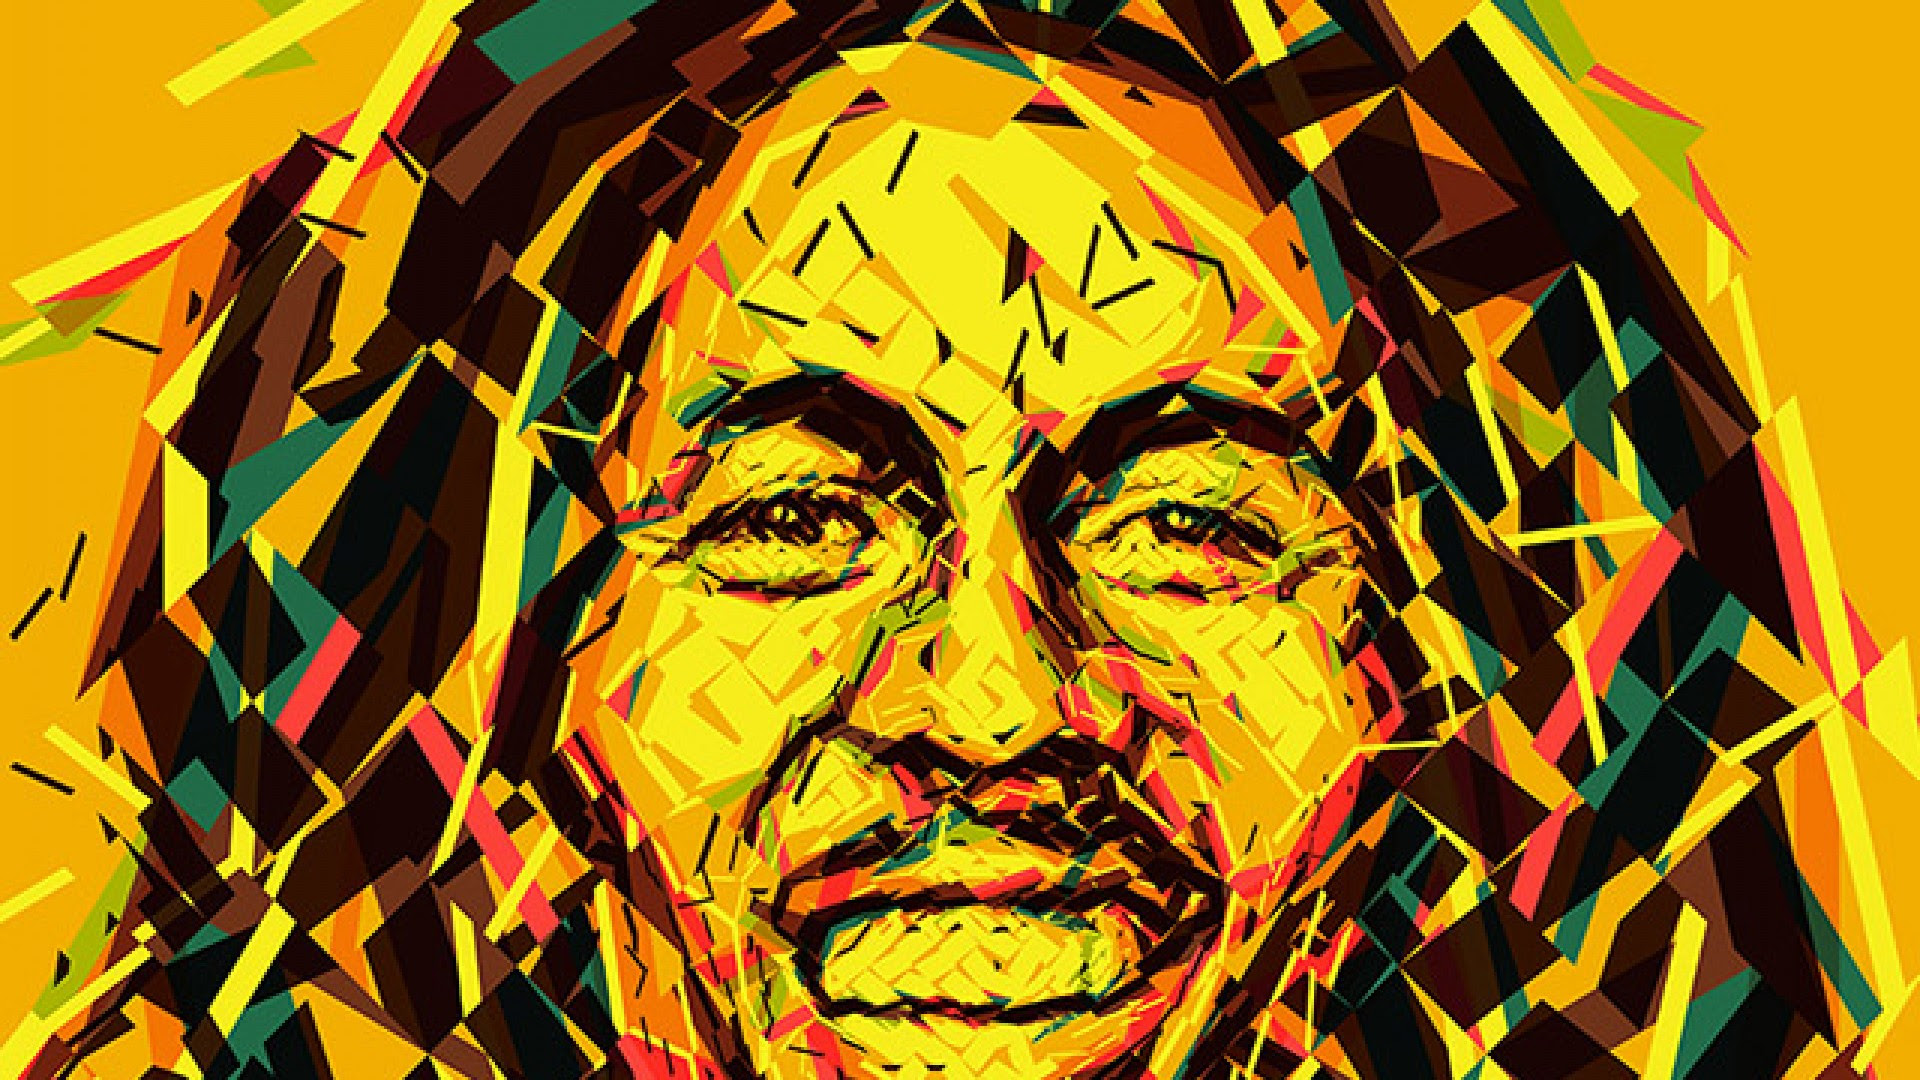 Bob Marley Wallpaper 1920x1080 49023